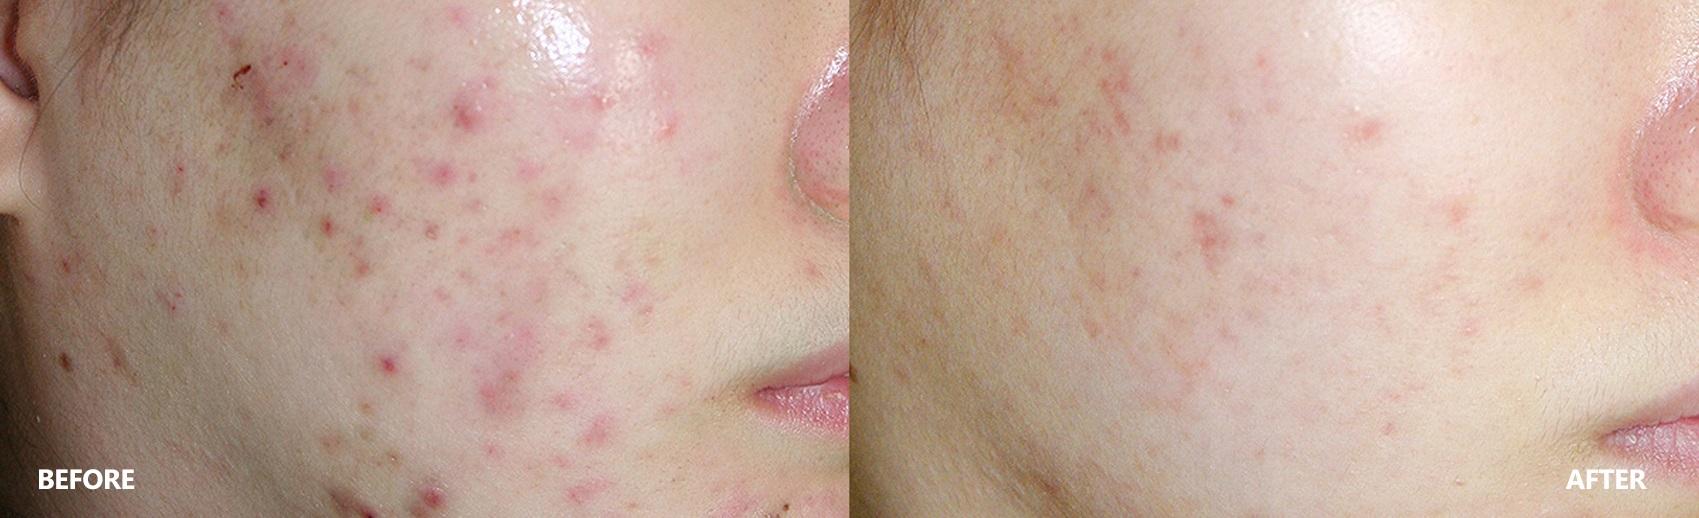 Acne Skin Result Before & After